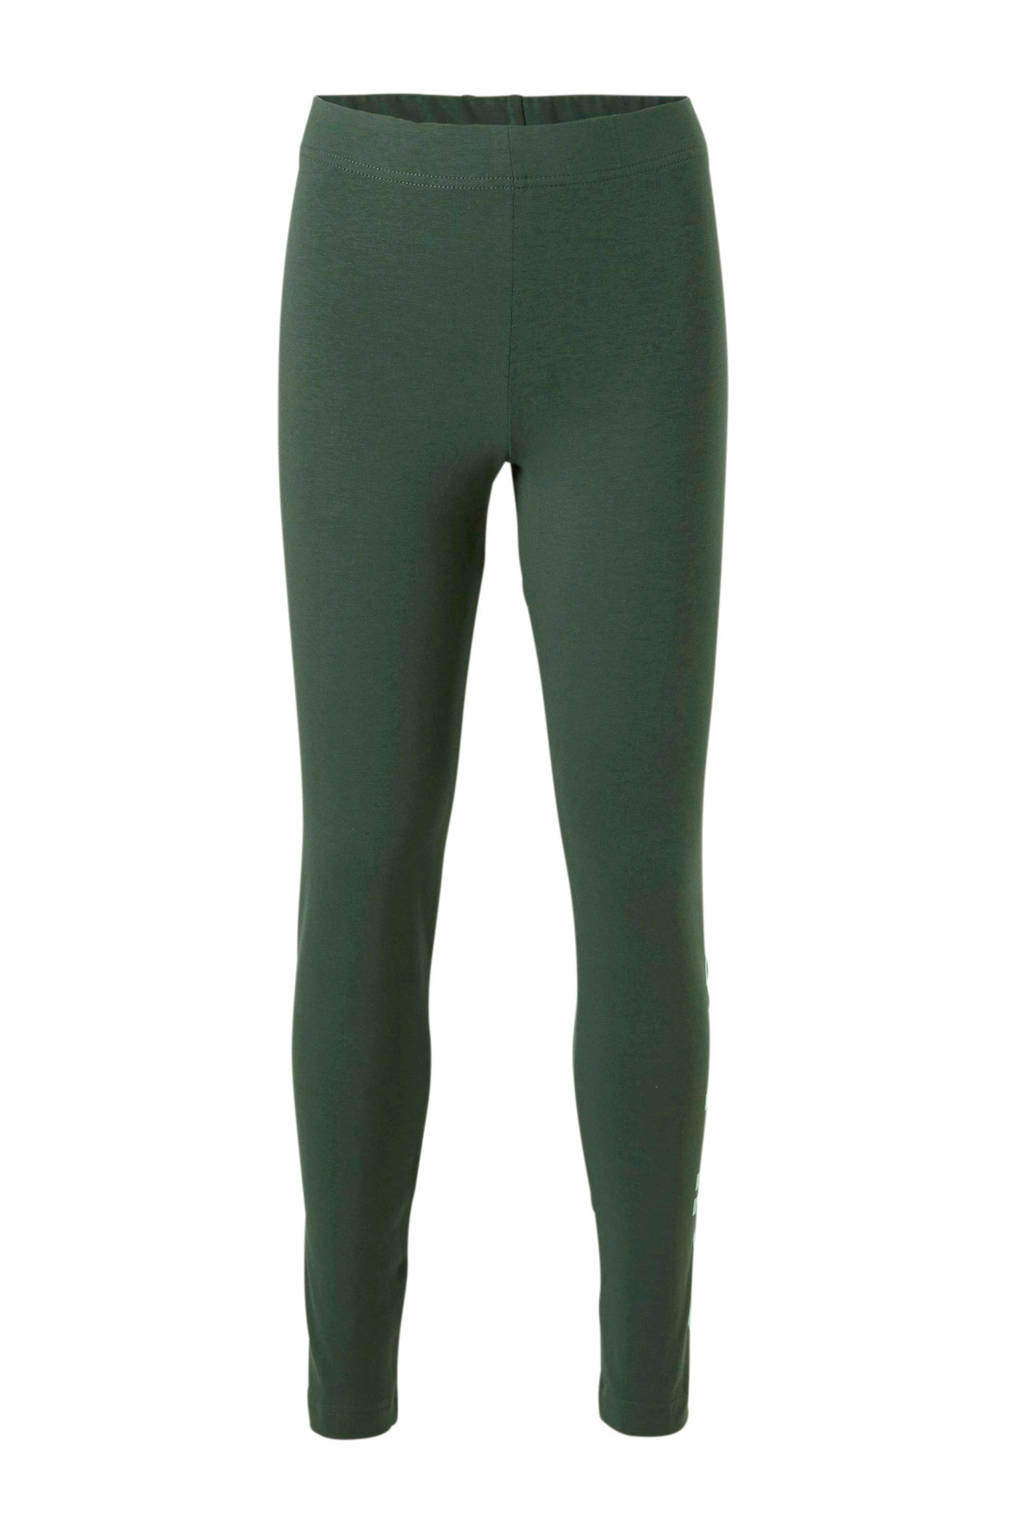 adidas performance sportbroek groen, Donkergroen/mintgroen